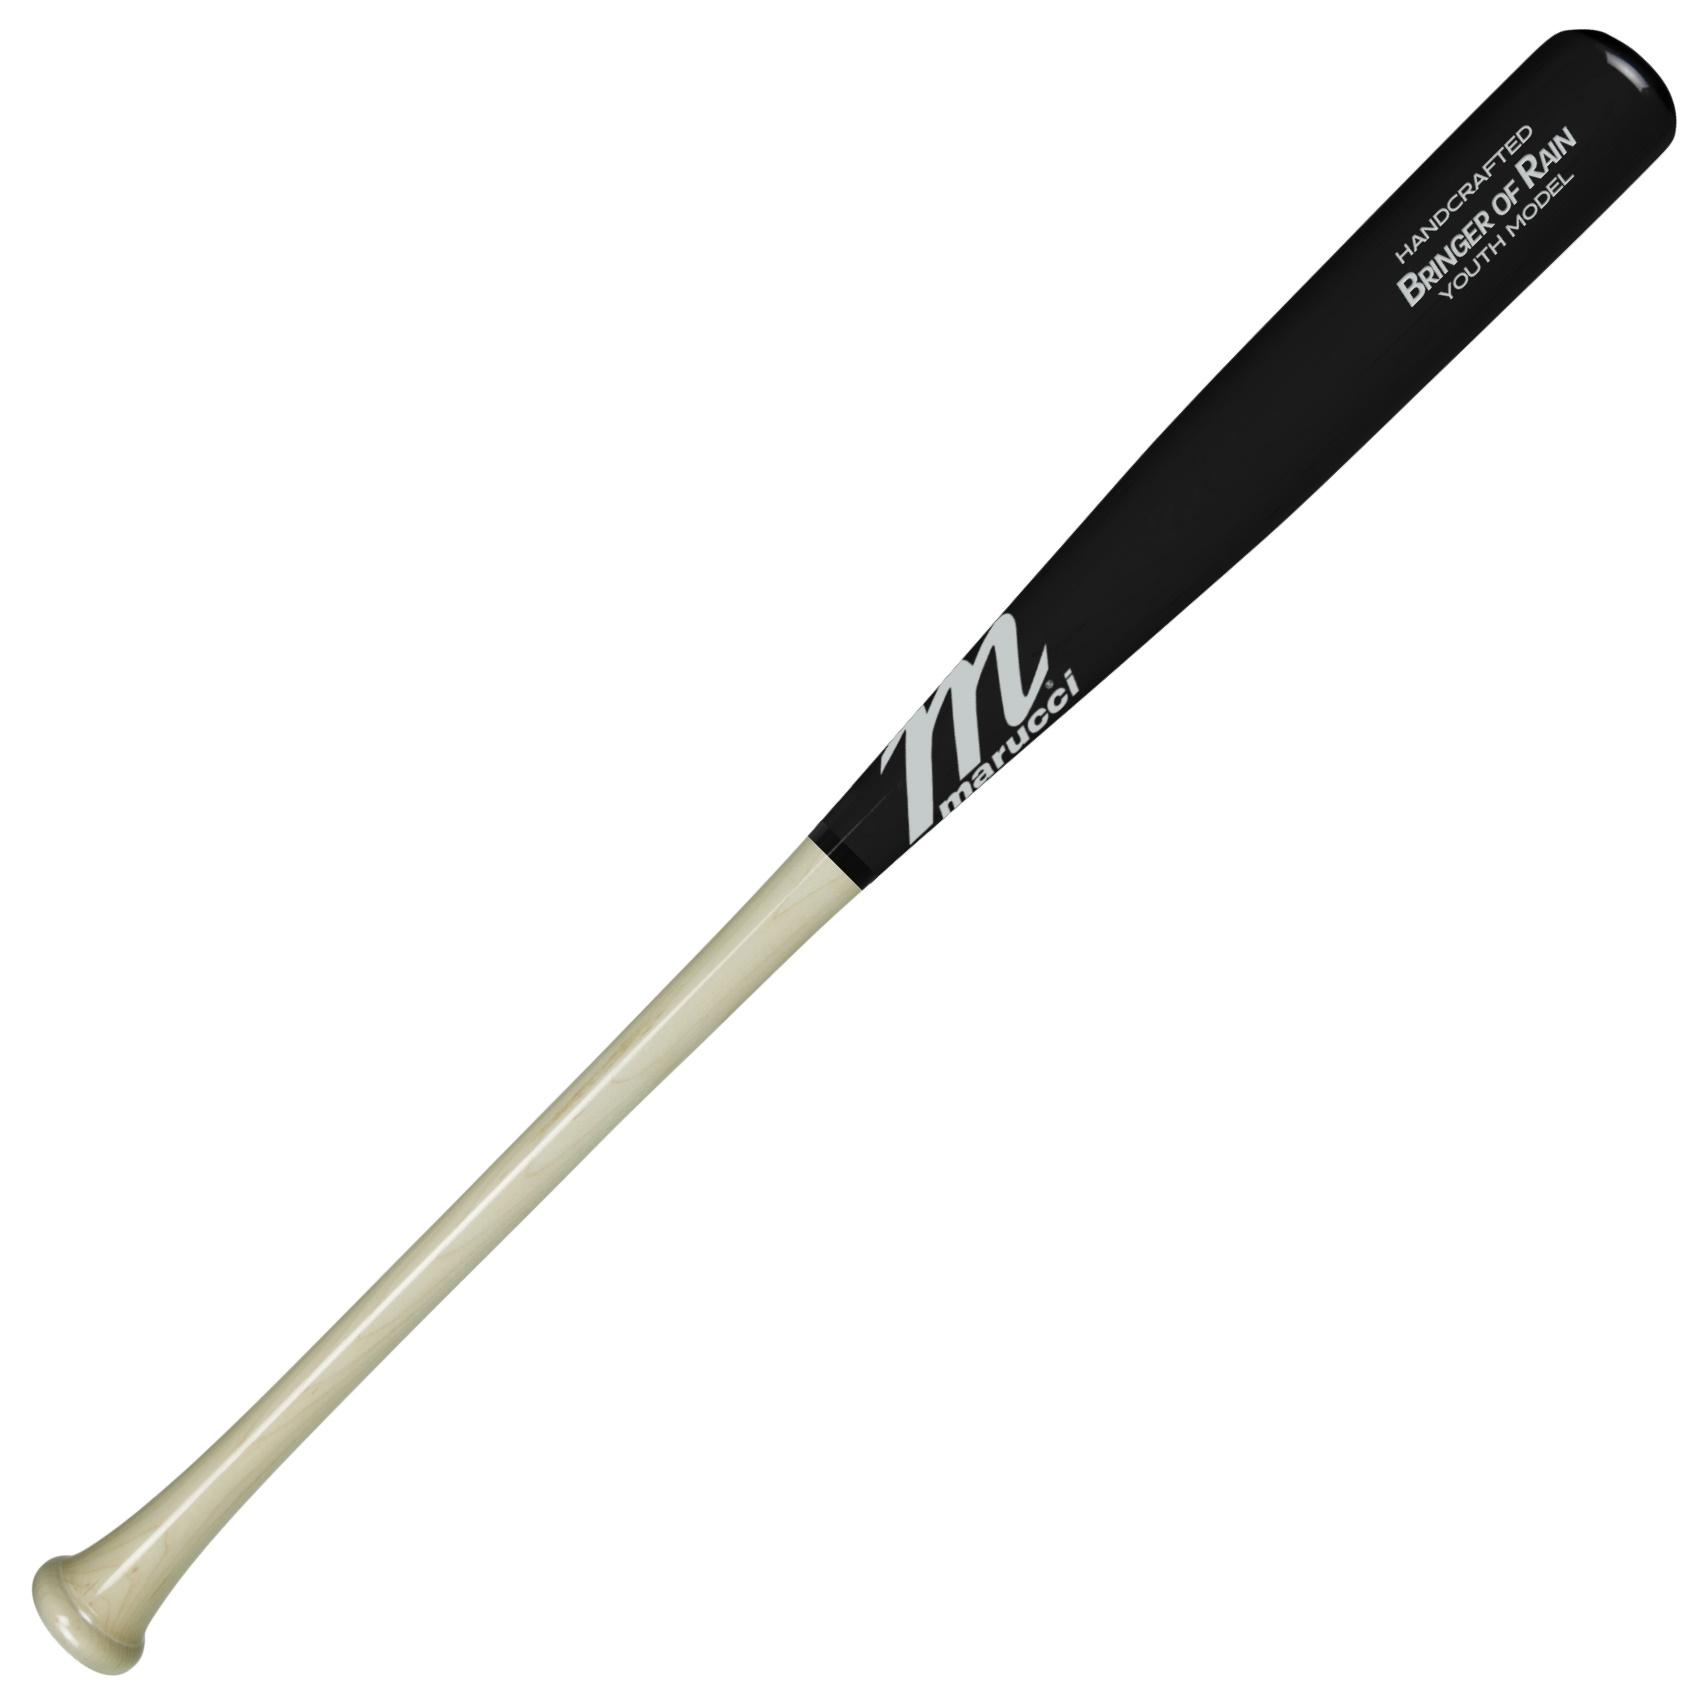 marucci-bringer-of-rain-youth-maple-wood-baseball-bat-29-inch MYVE2BOR-NBK-29 Marucci 840058700817 <h1 class=productView-title-lower>YOUTH JOSH DONALDSON BRINGER OF RAIN PRO MODEL</h1> <span>The Bringer